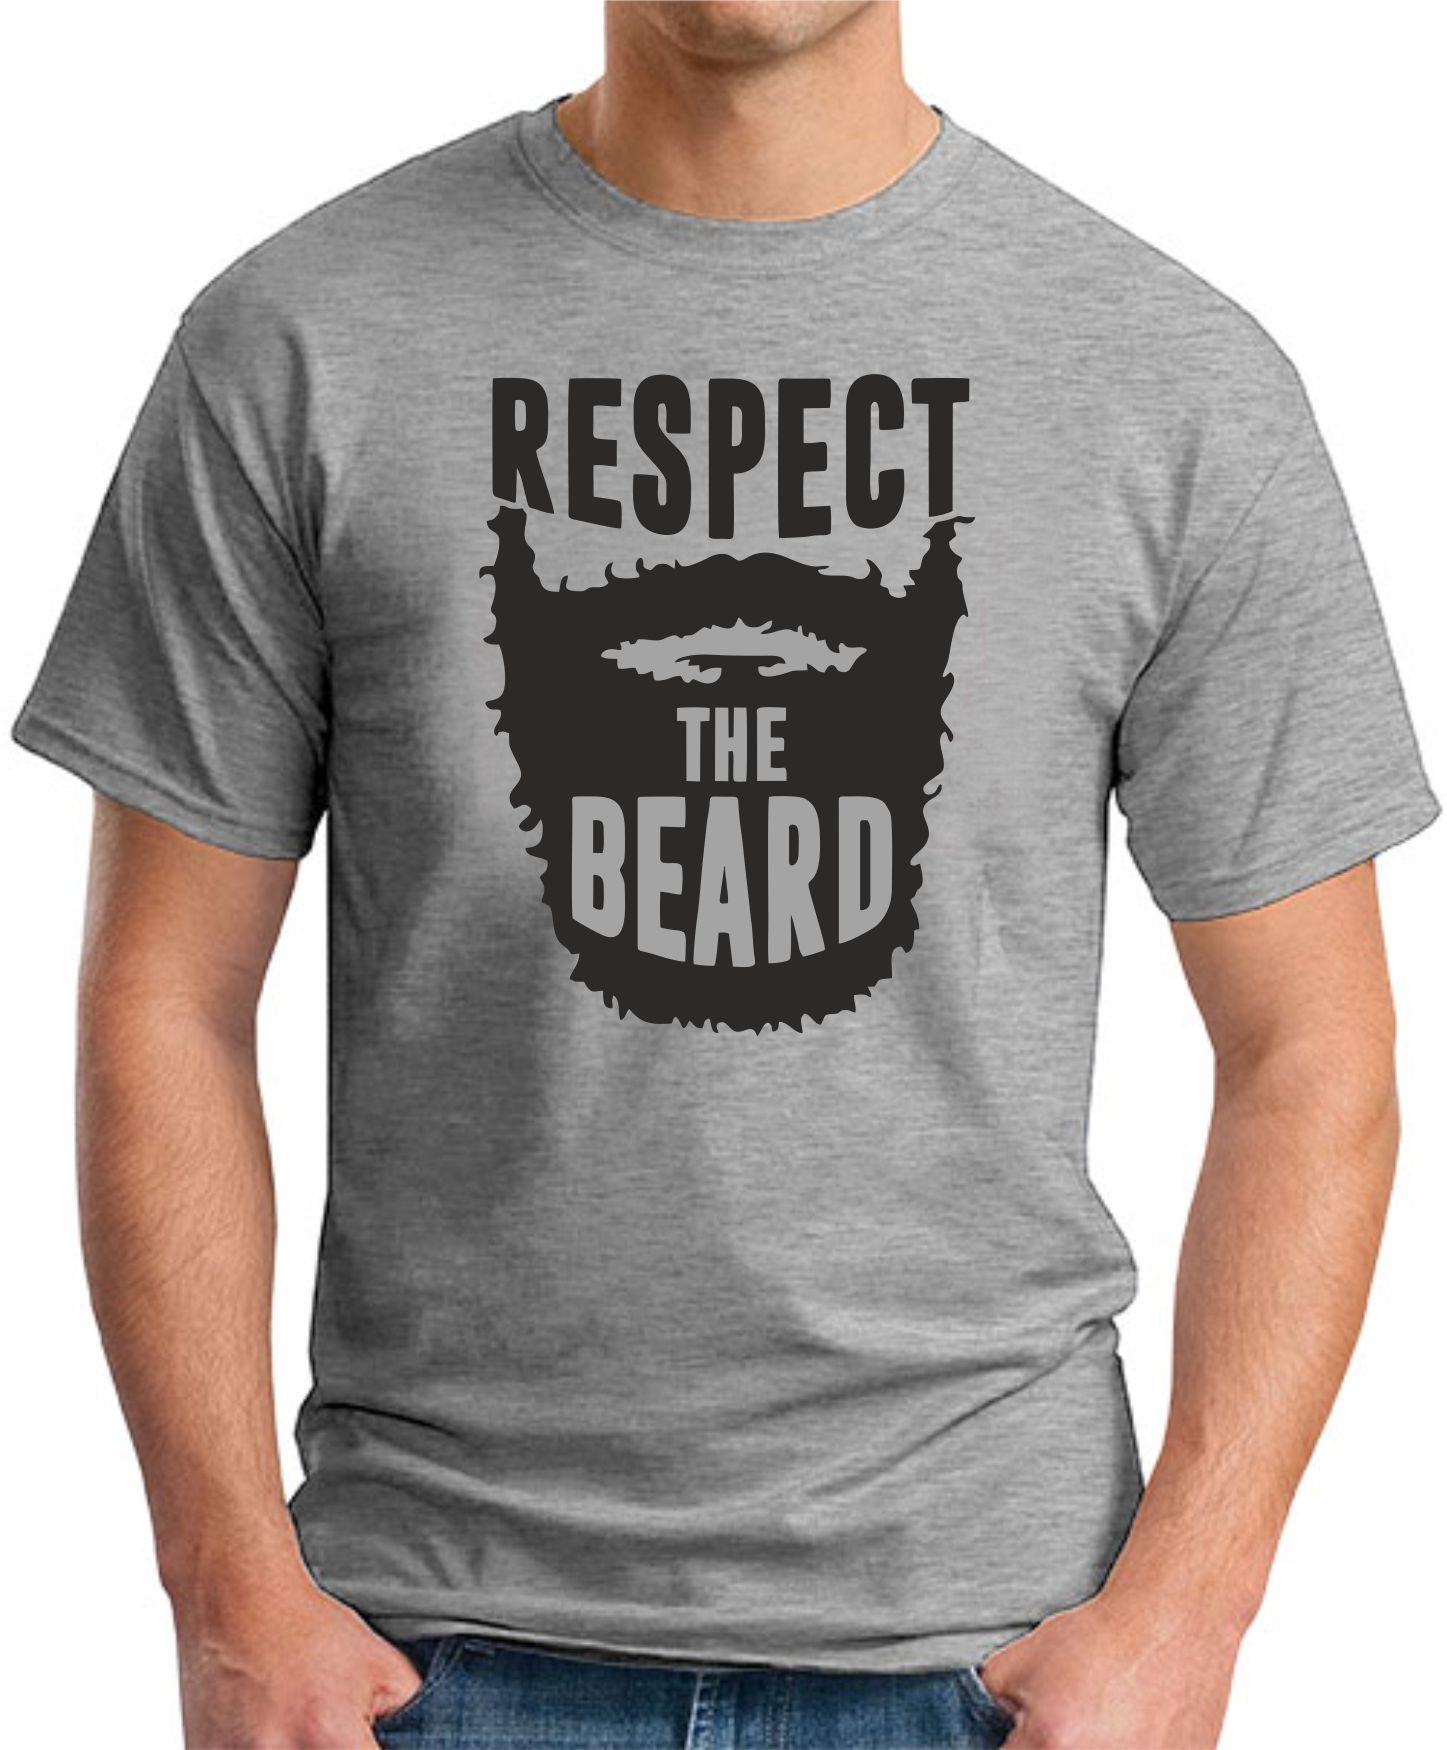 RESPECT THE BEARD - Grey